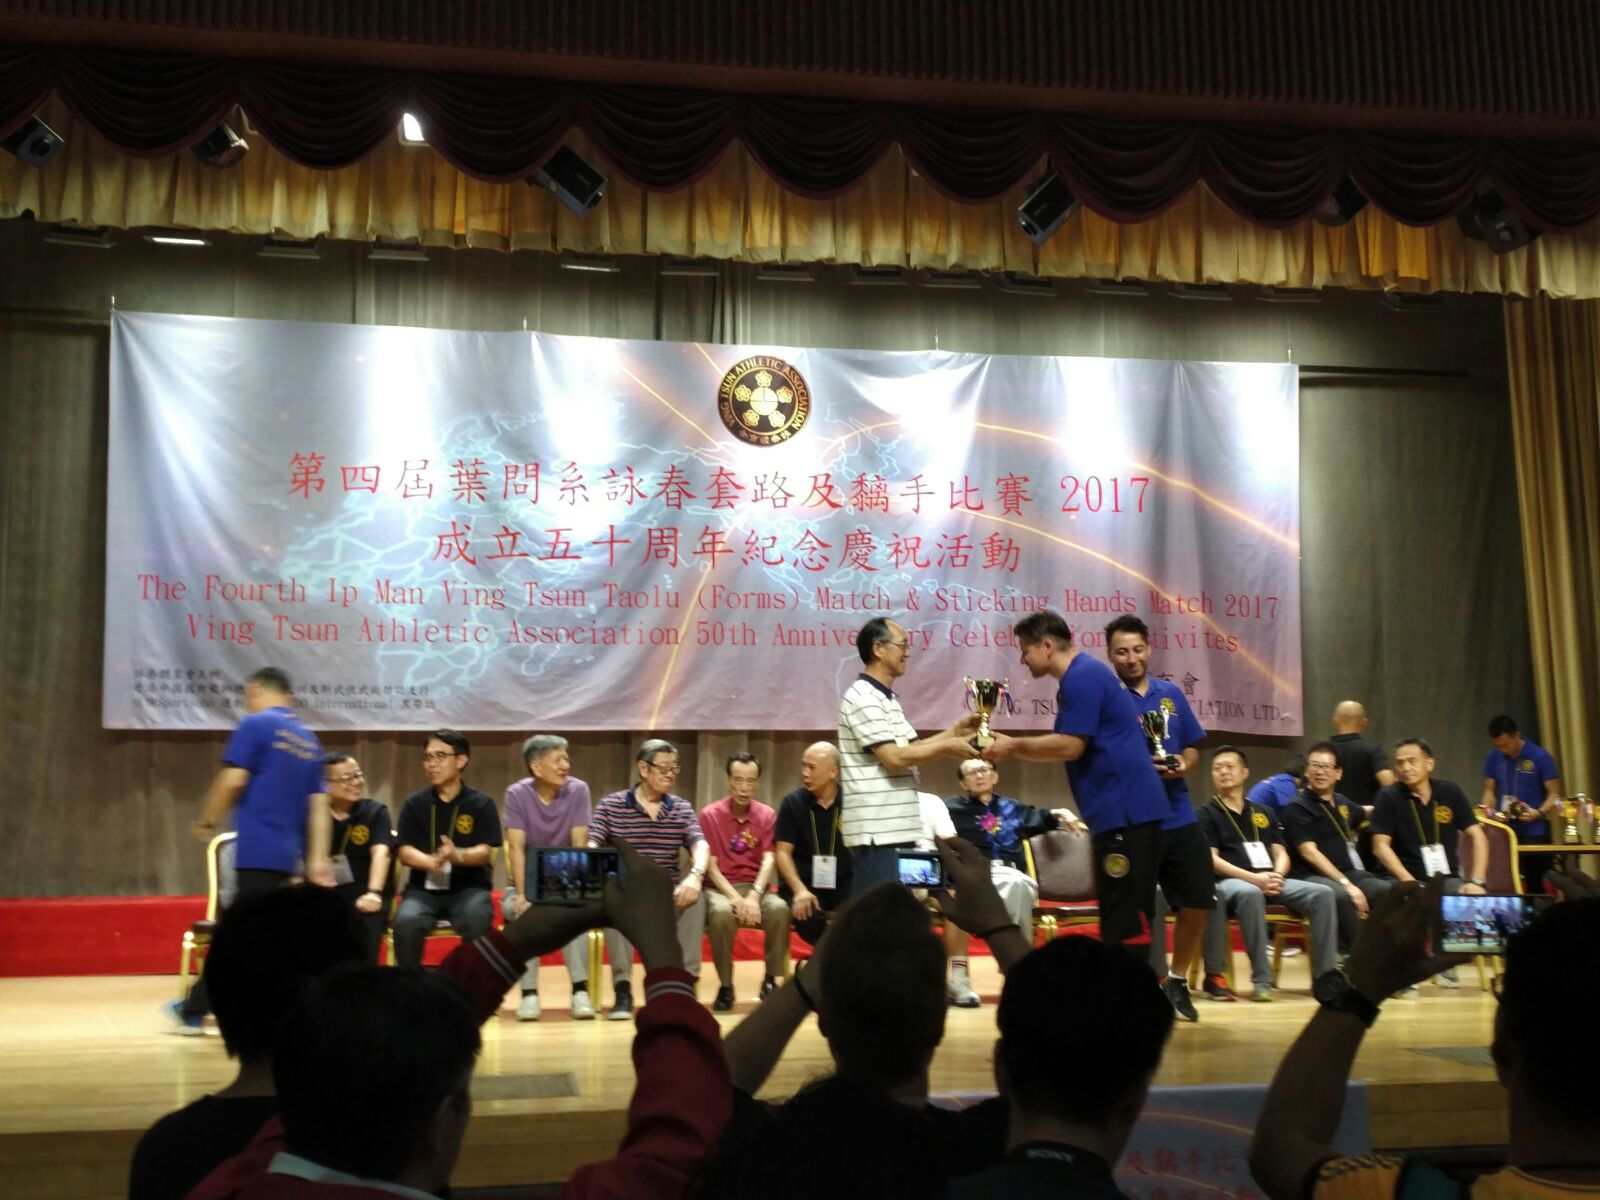 VTAA Champion of Hongkong 2017 Siegerehrung Hongkong